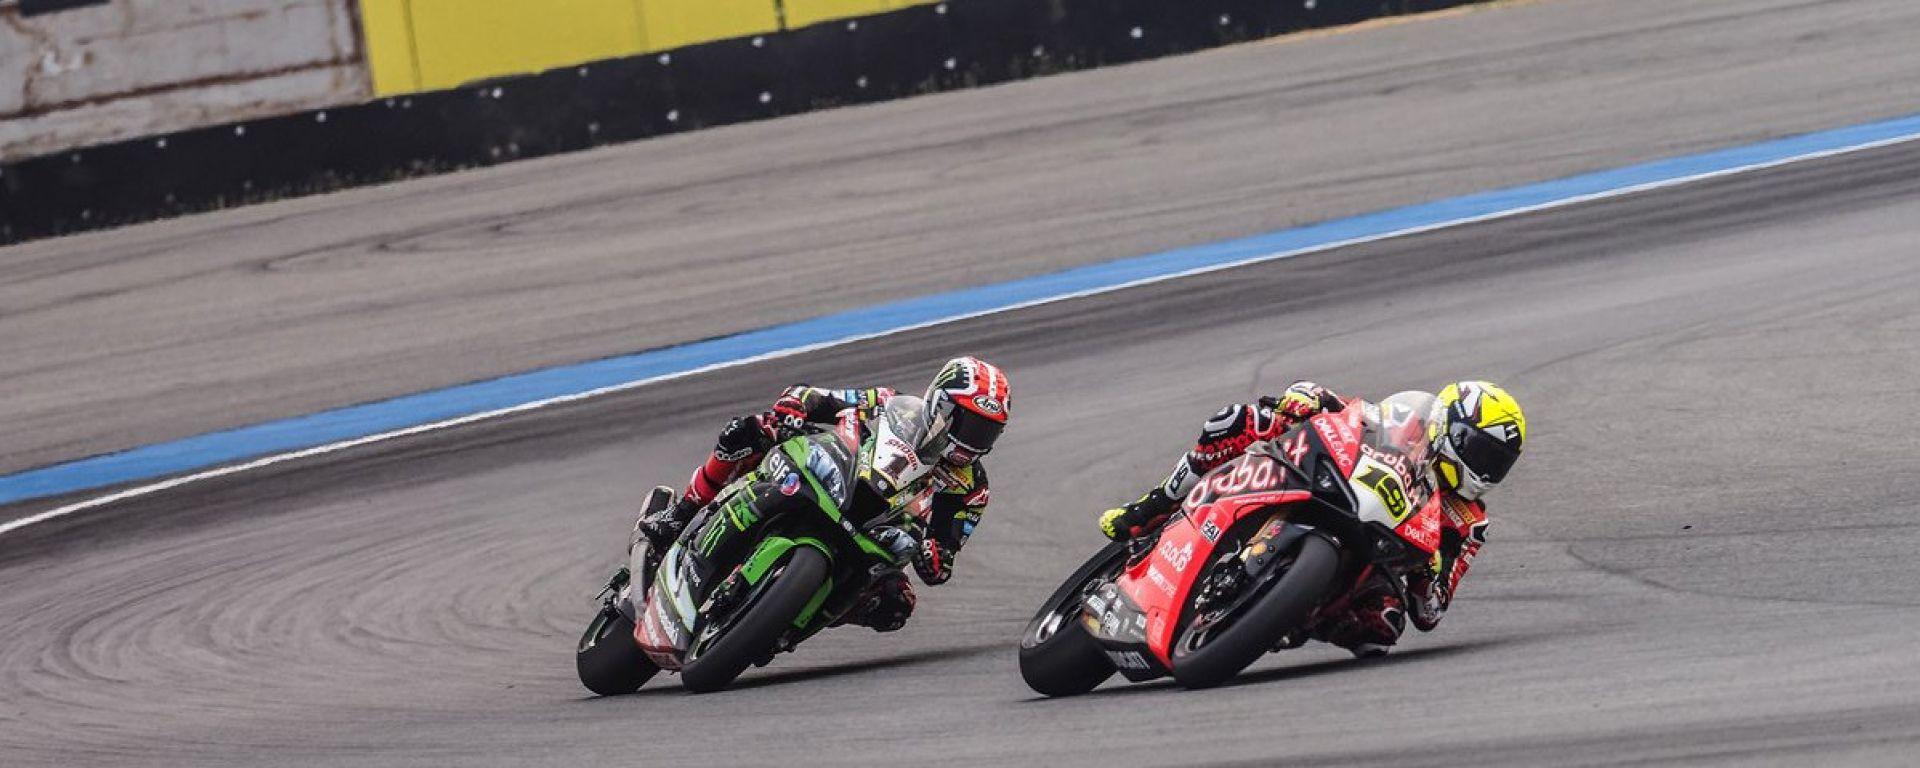 Superbike 2019: classifica piloti e team